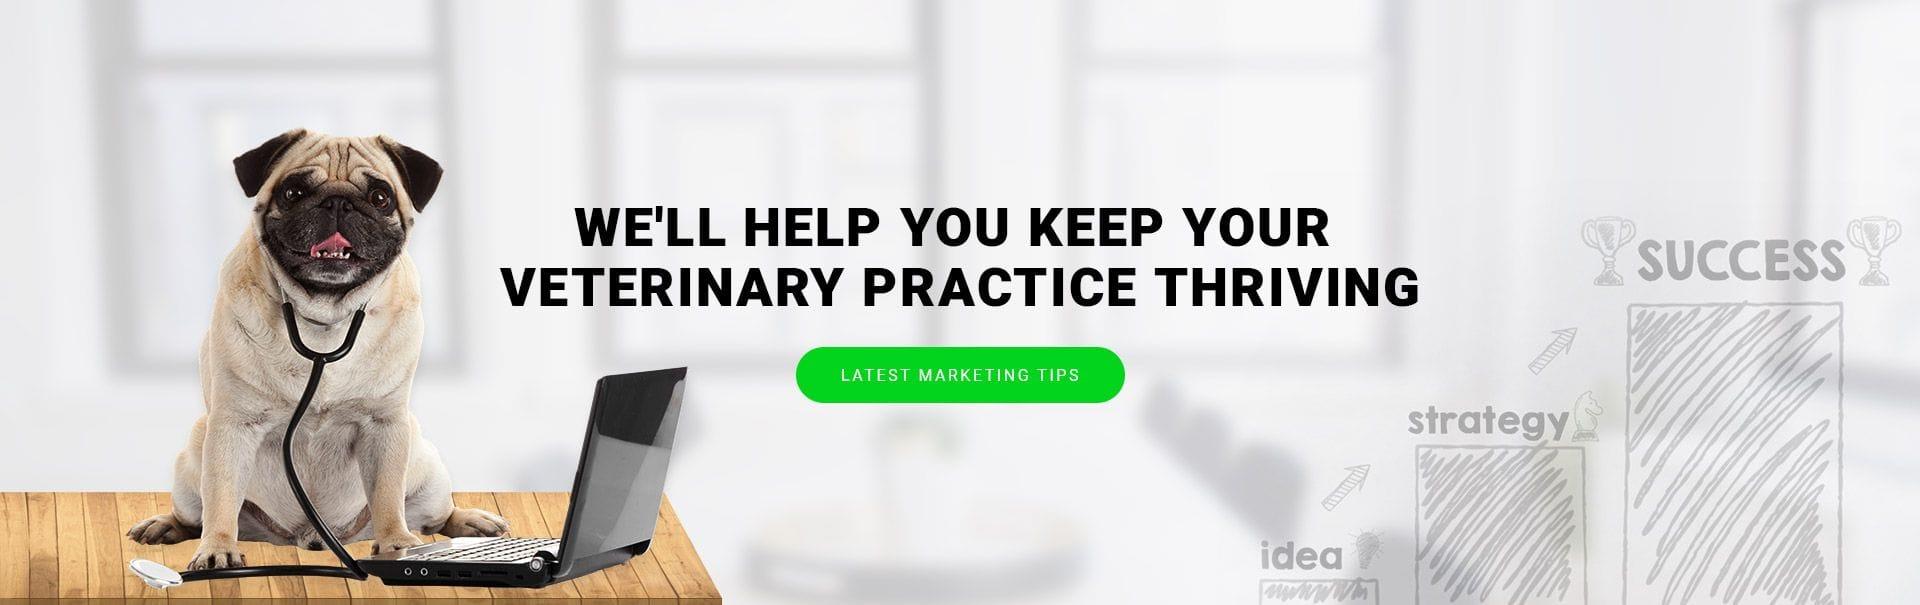 Vet Marketing Services | Websites, Email Marketing, Content Writing, Digital Marketing